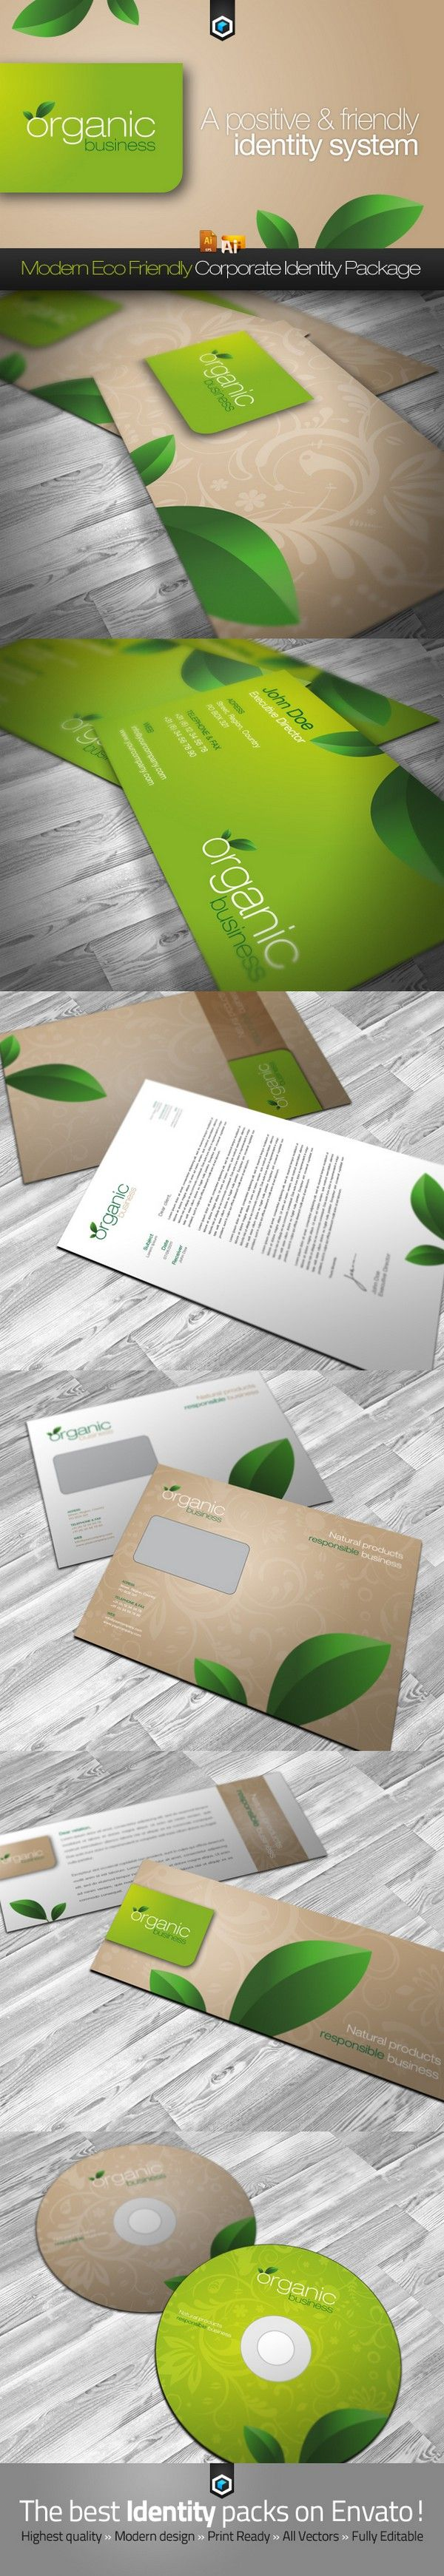 1060 Best Business Cards Images On Pinterest Business Card Design